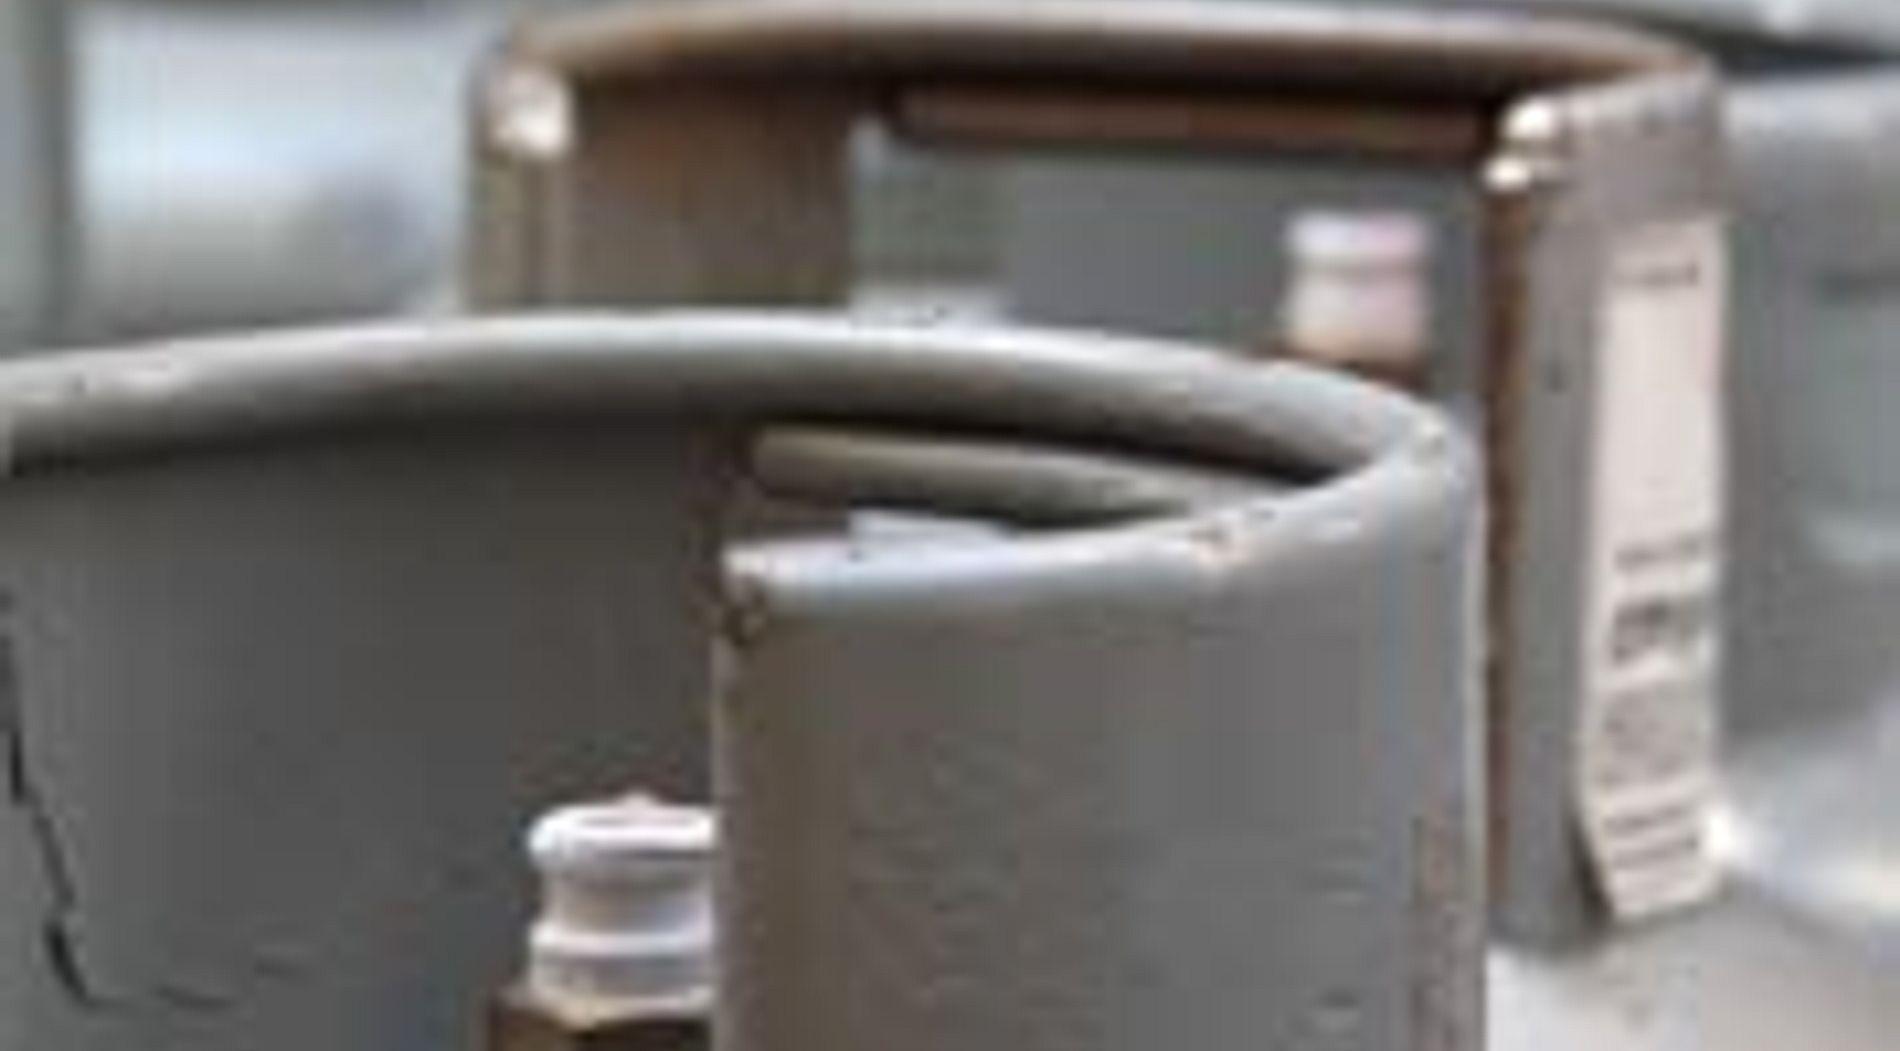 Top of a propane tank